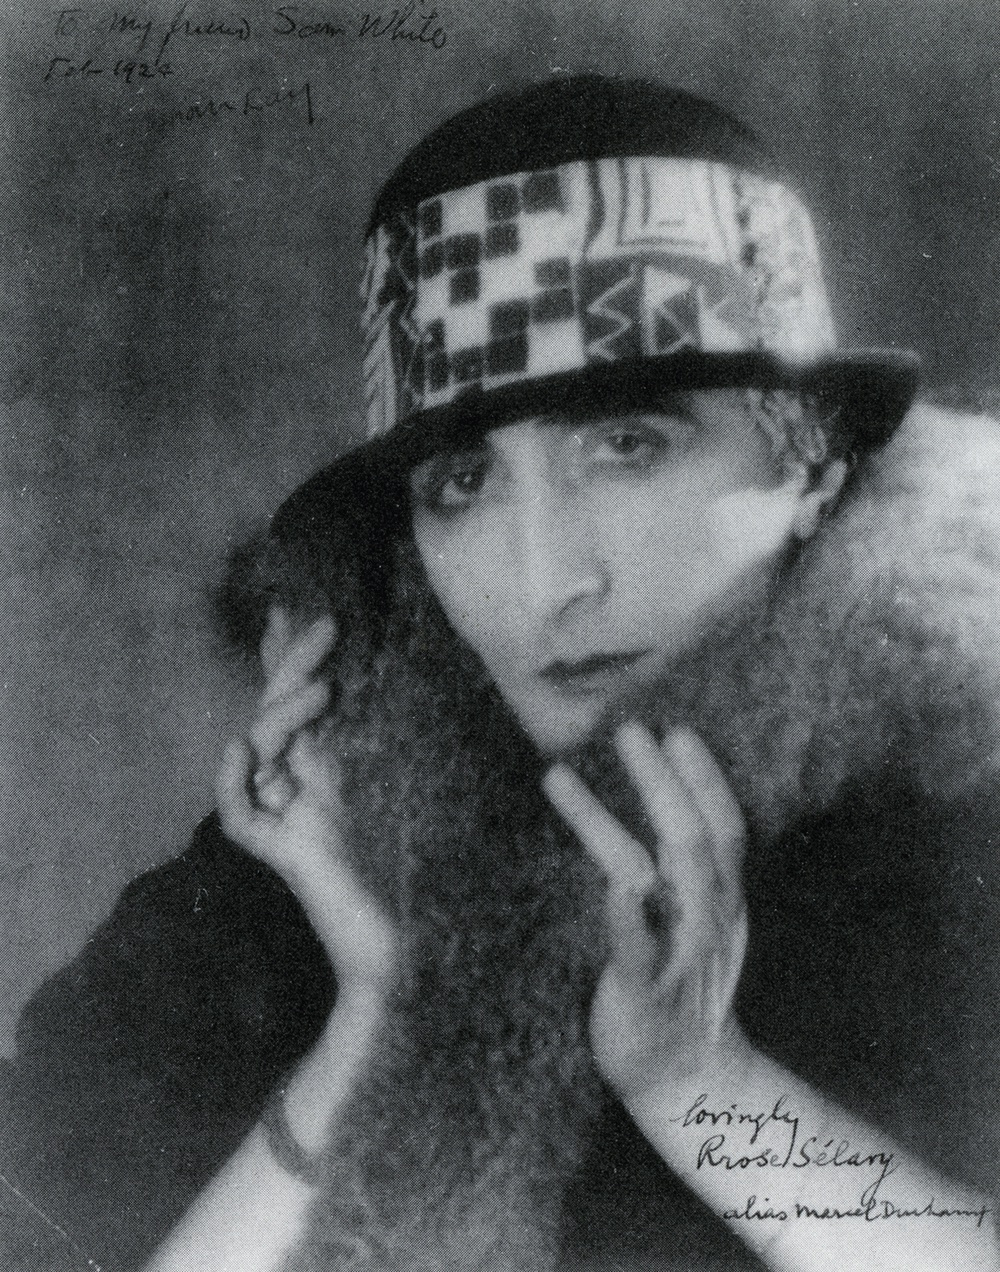 Marcel Duchamp in drag as Rrose Selavy